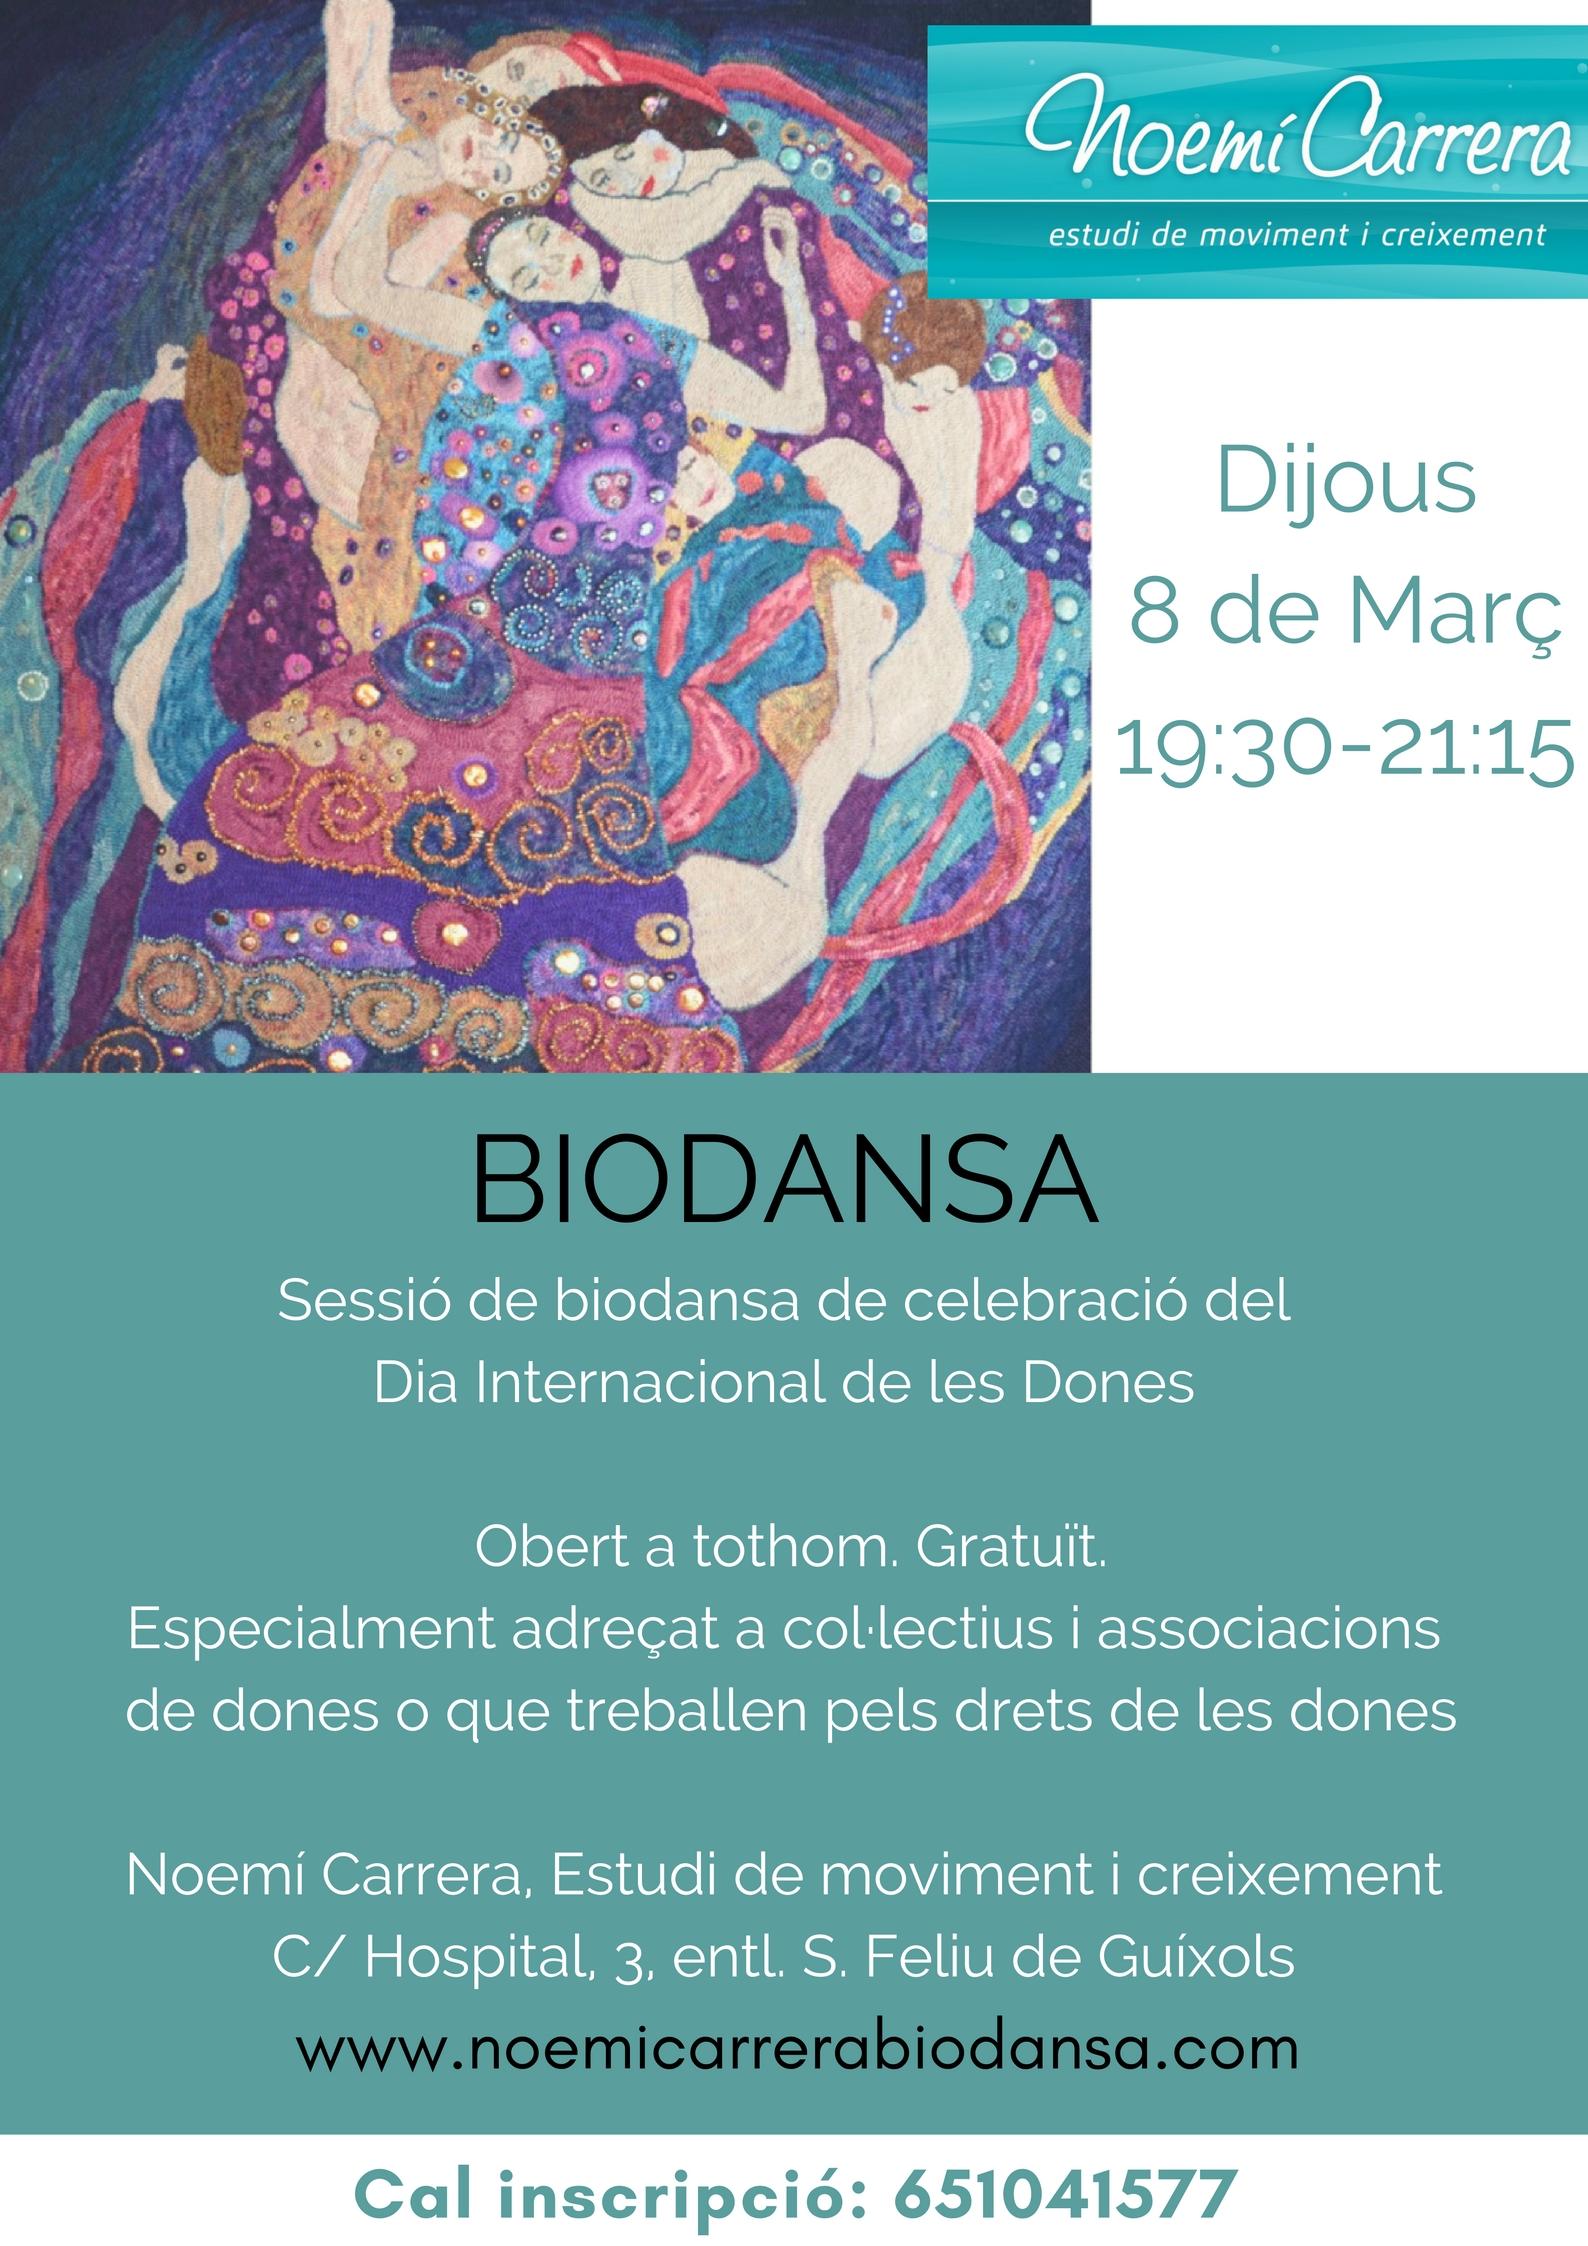 Dia de la Dona_Biodansa_Noemí Carrera_8-3